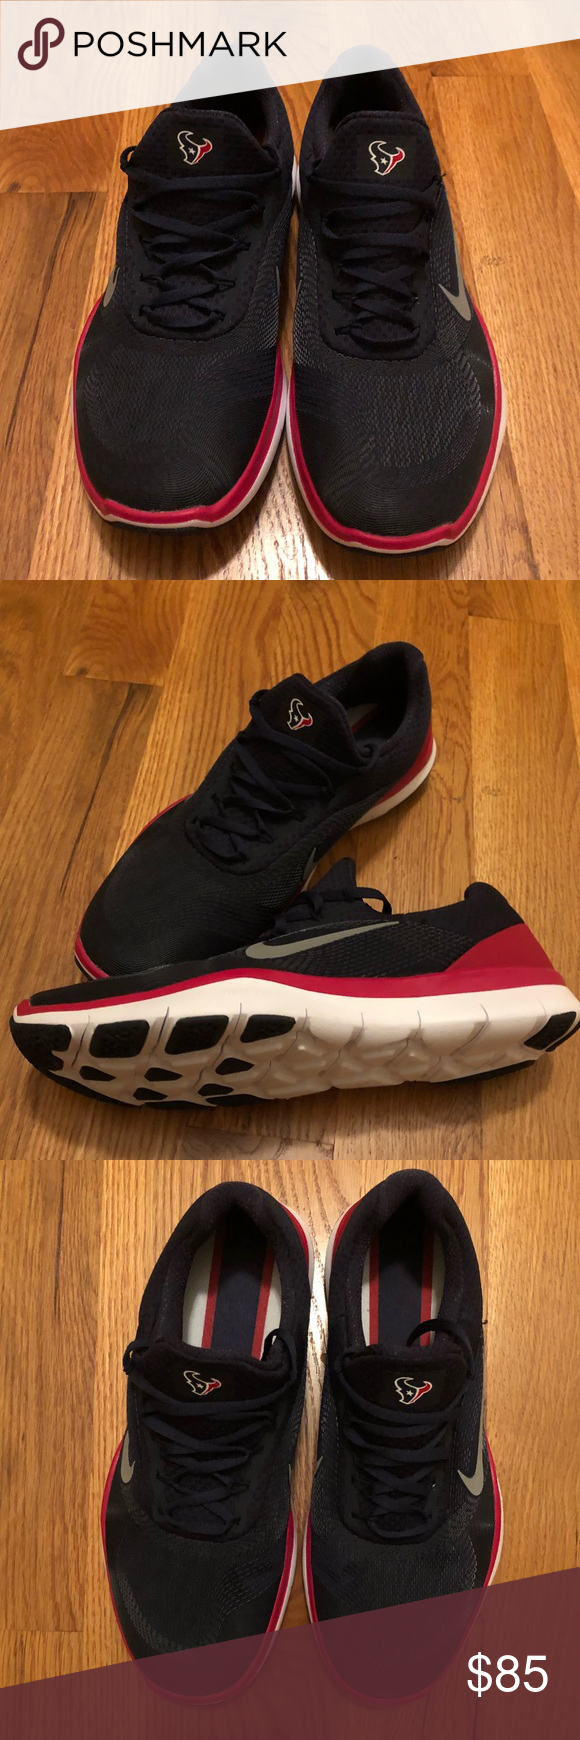 565dae2847b NWOT Men s Nike Houston Texans sneakers Men s size 10 Nike Free Trainer V7  Limited Edition Houston Texans